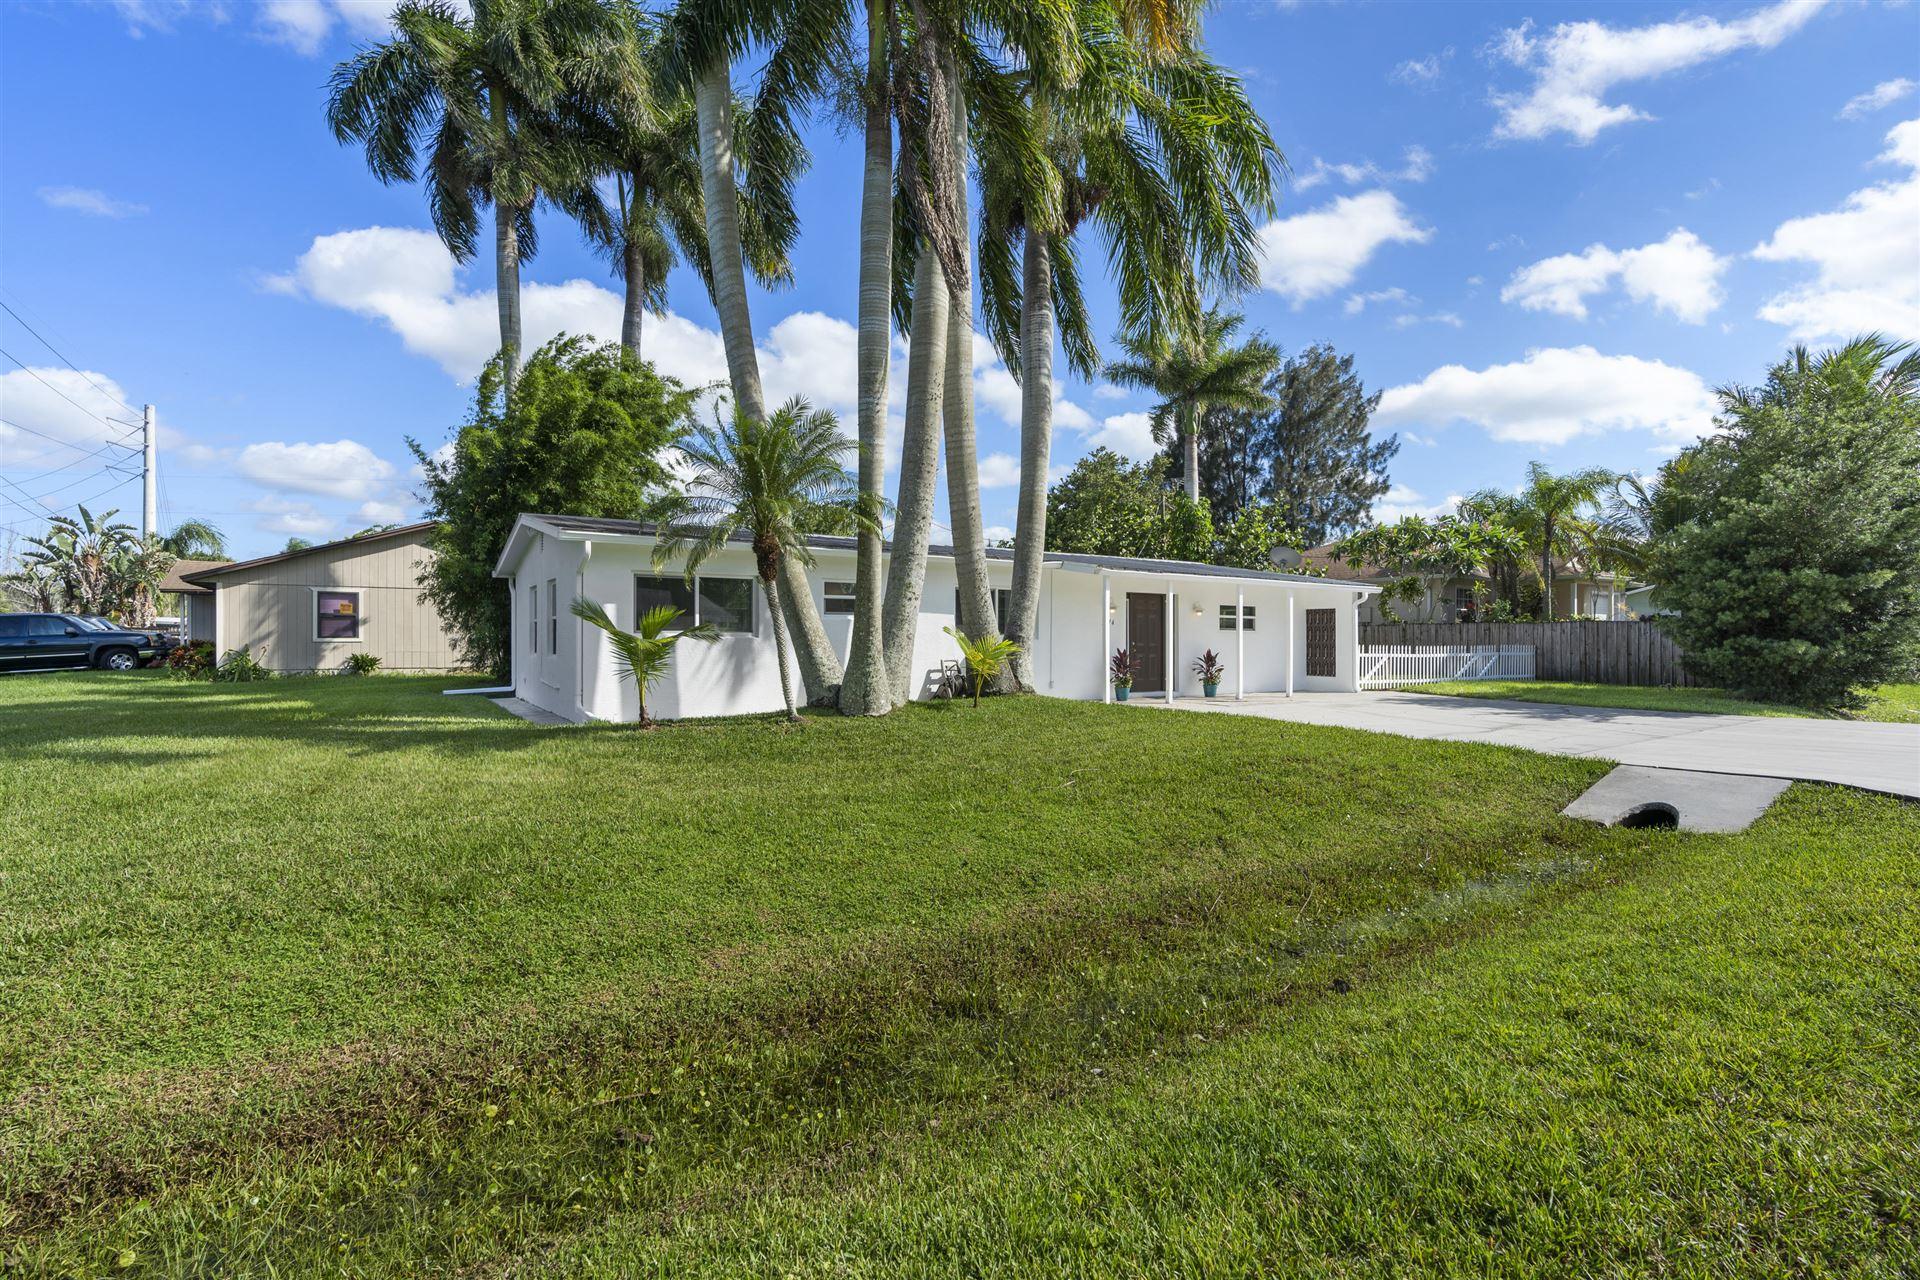 3074 SE Banyan Street, Stuart, FL 34997 - #: RX-10630525